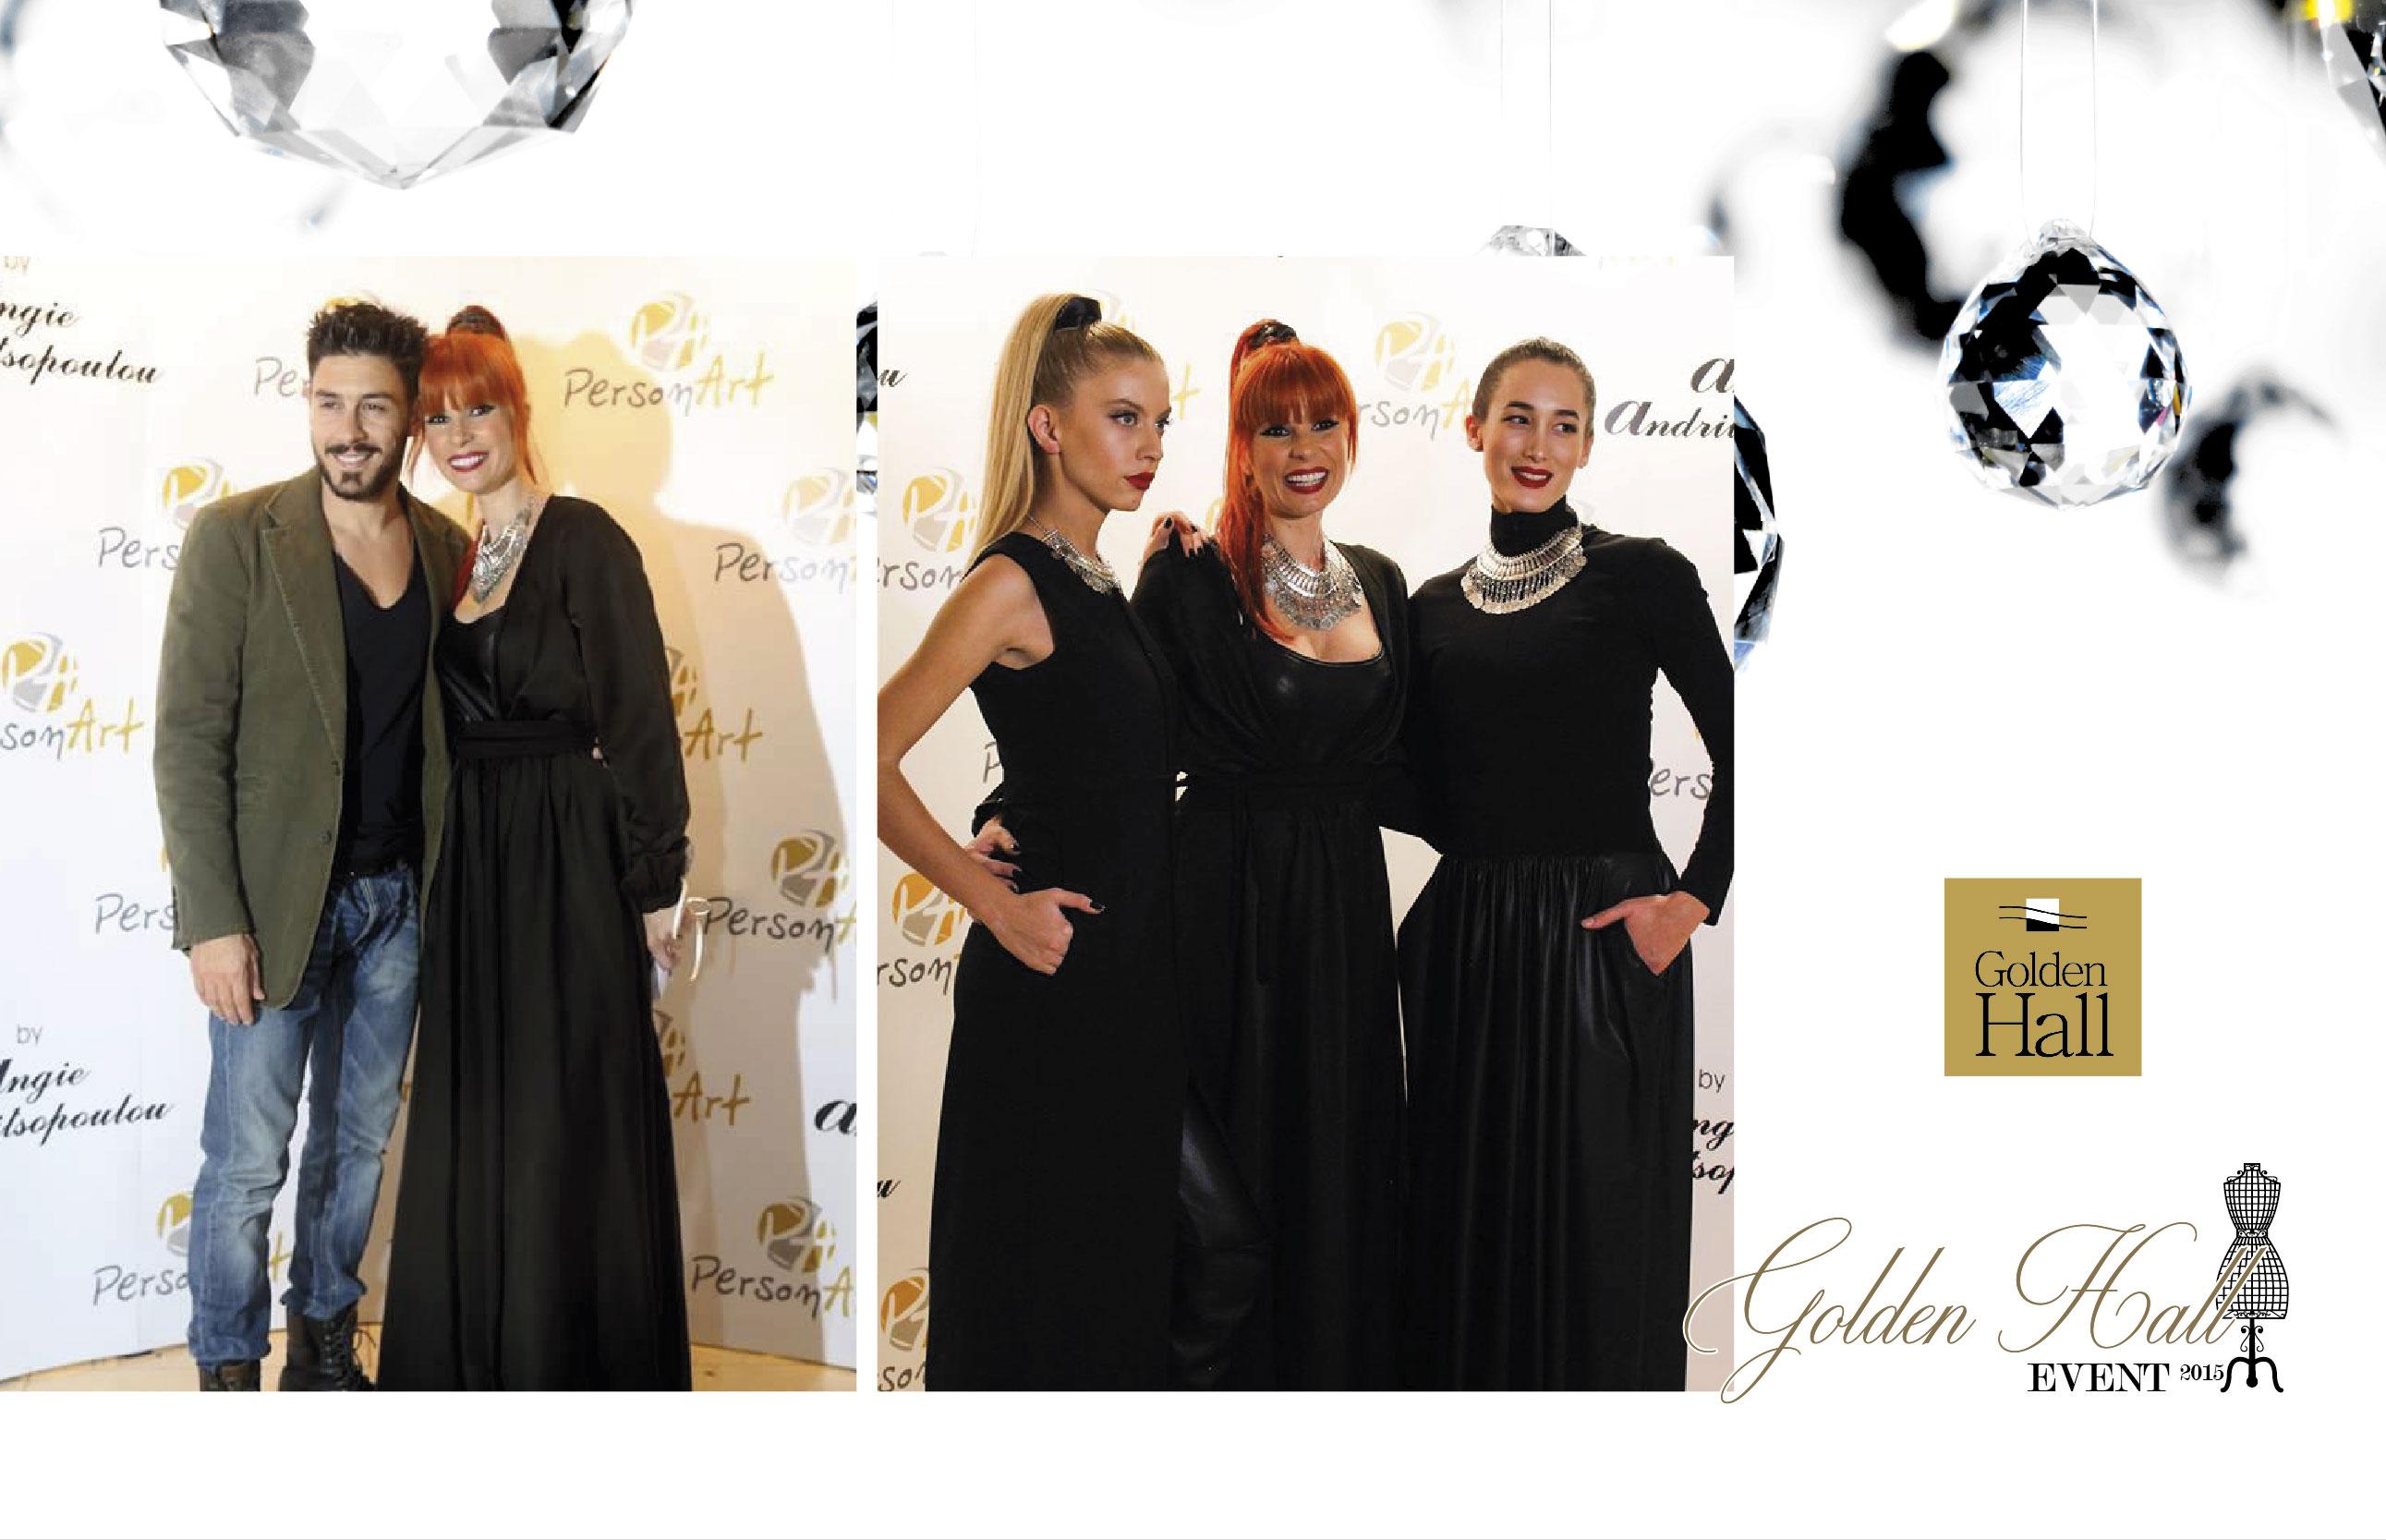 golden-hall-event-2015-04